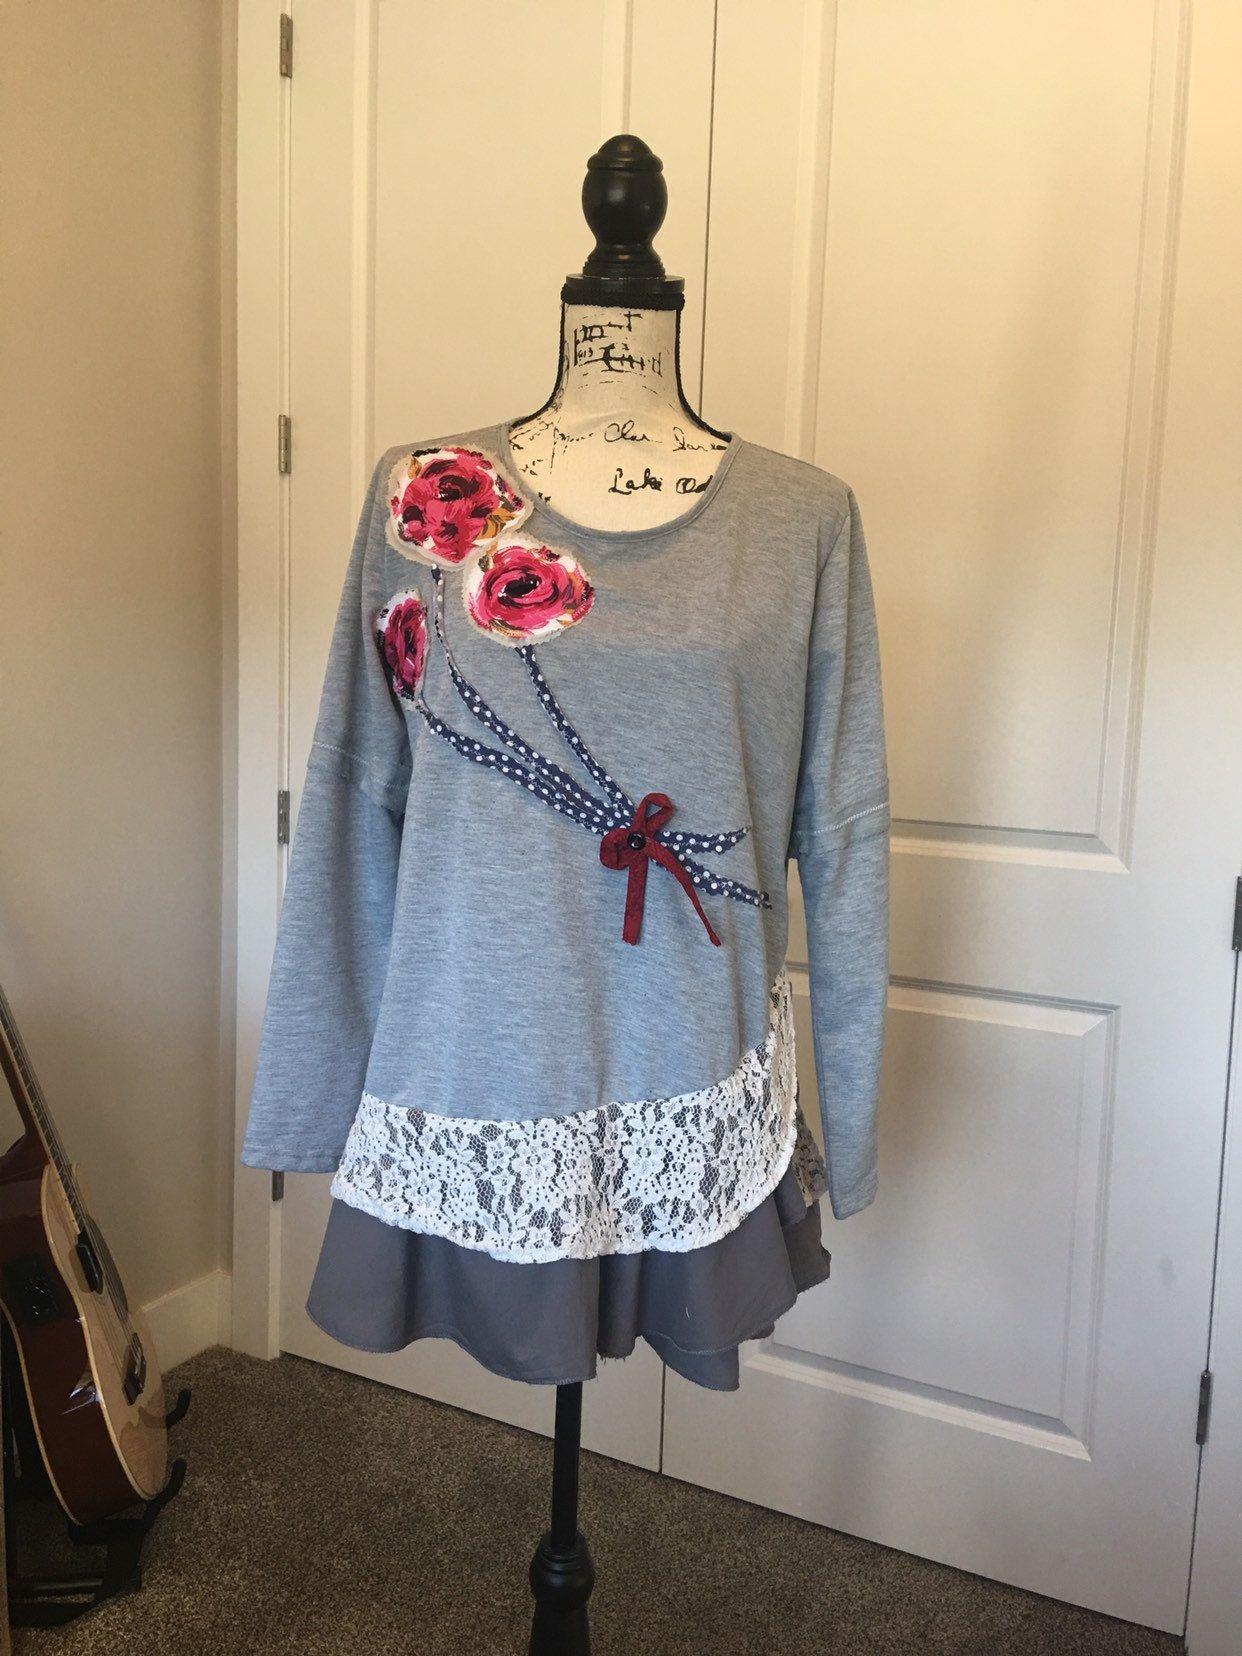 146c5486fea0c Women's Tunic XL Plus Vintage Gypsy Dress Shabby Chic Clothing ...